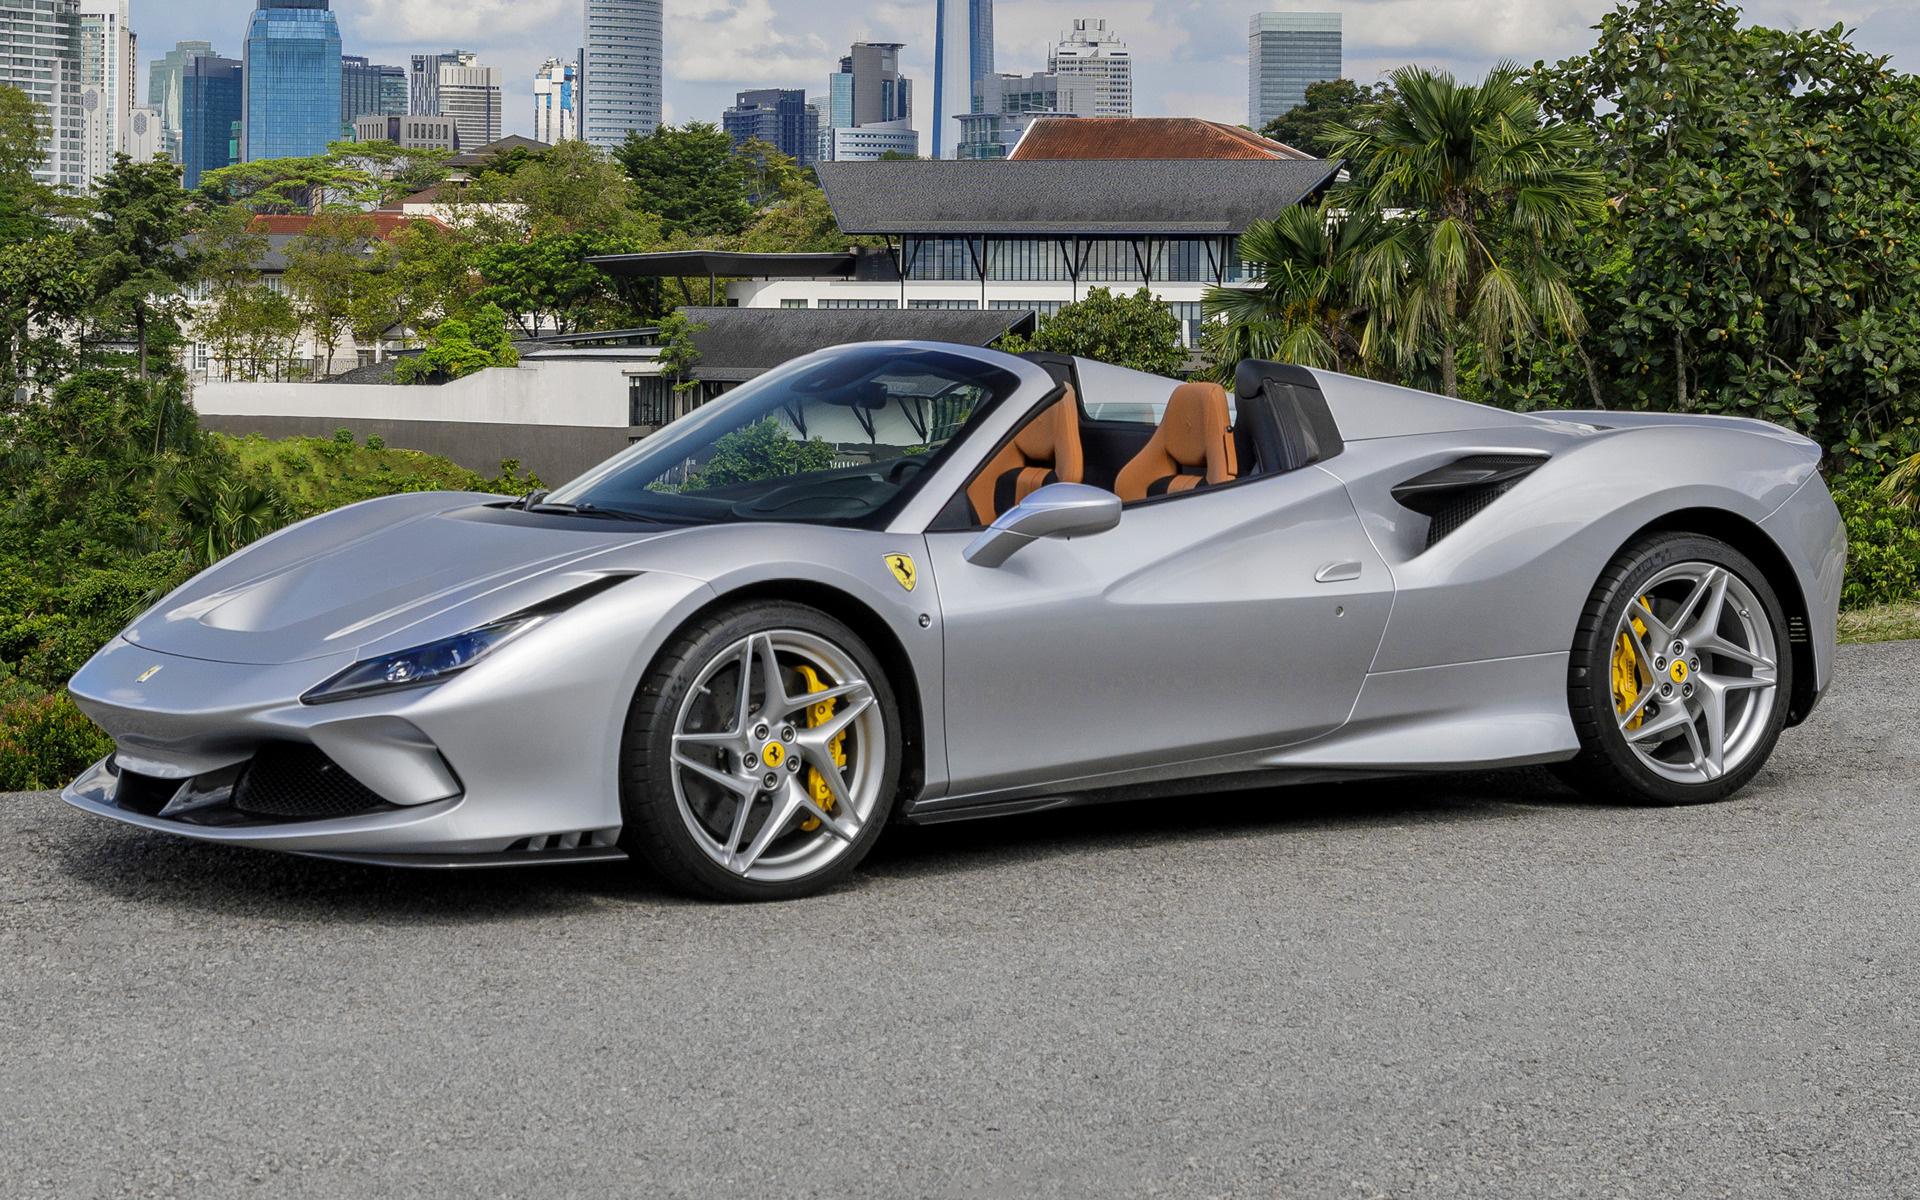 2020 Ferrari F8 Spider Wallpapers And Hd Images Car Pixel